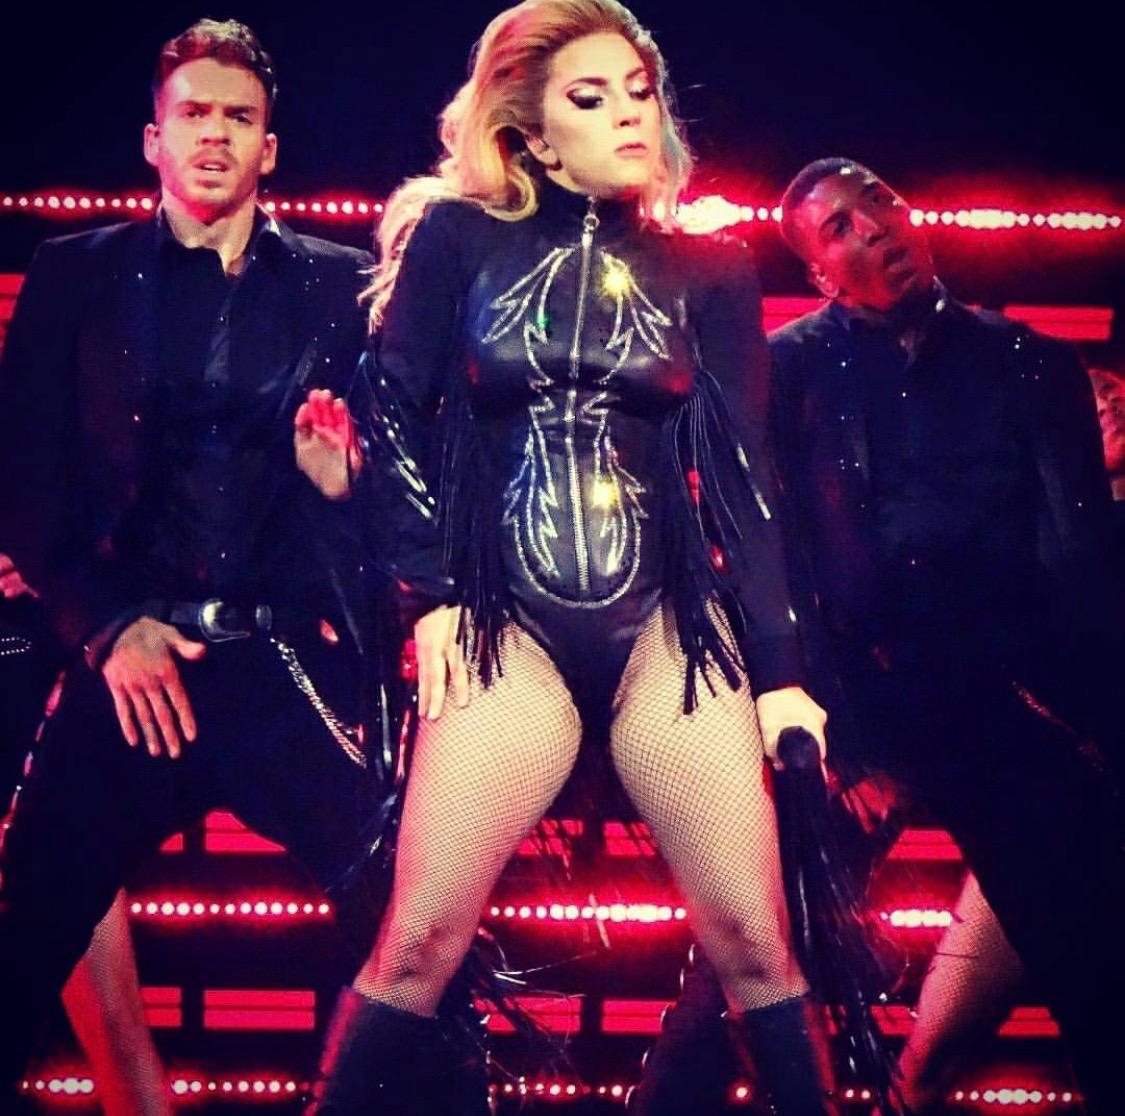 """Pokerface"" at Joanne World Tour"